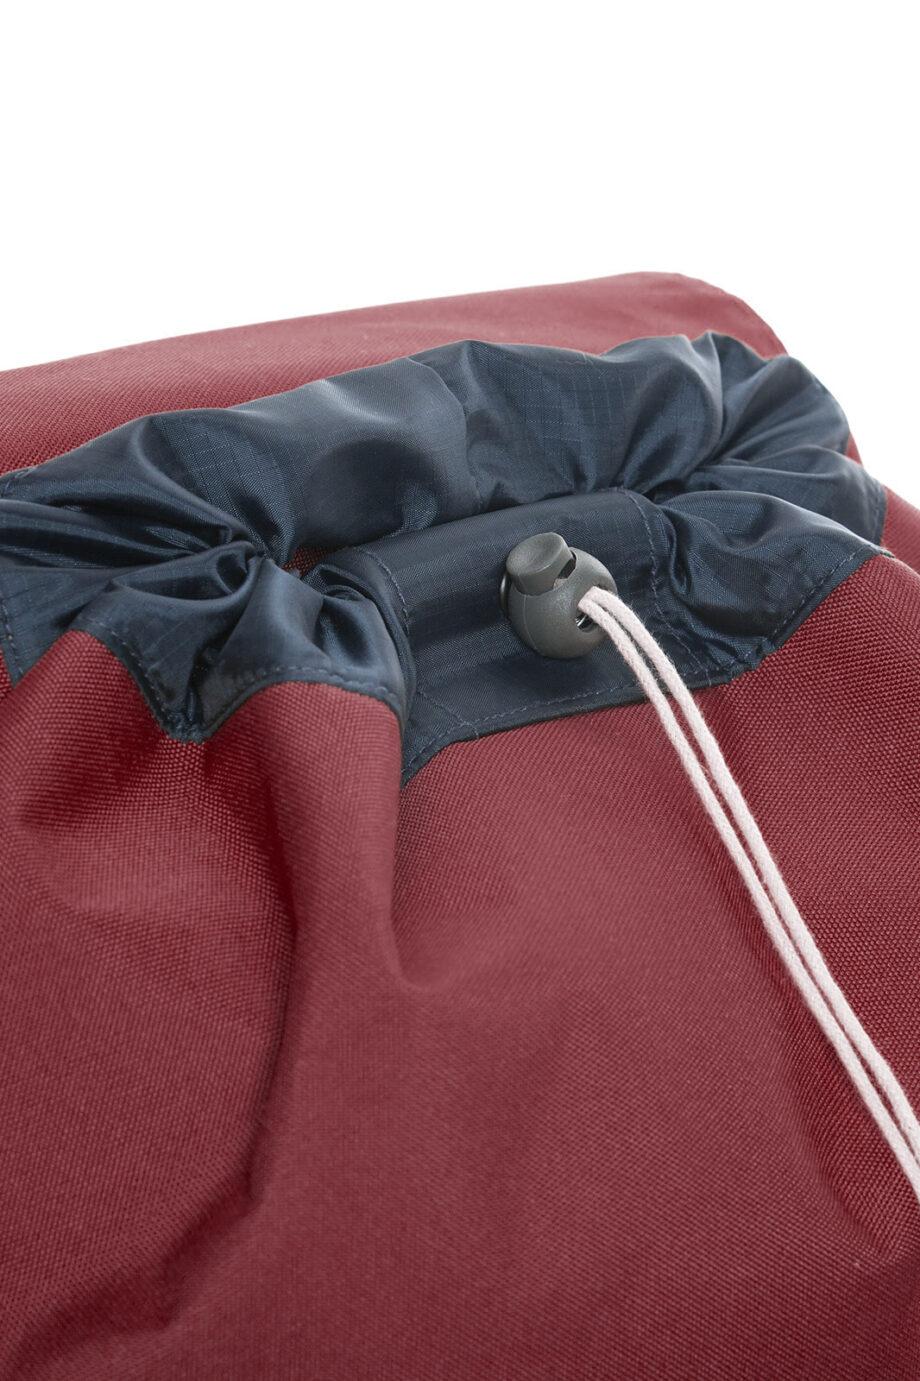 Duurzame tassen_Lefrik_Scout_Granate_boven